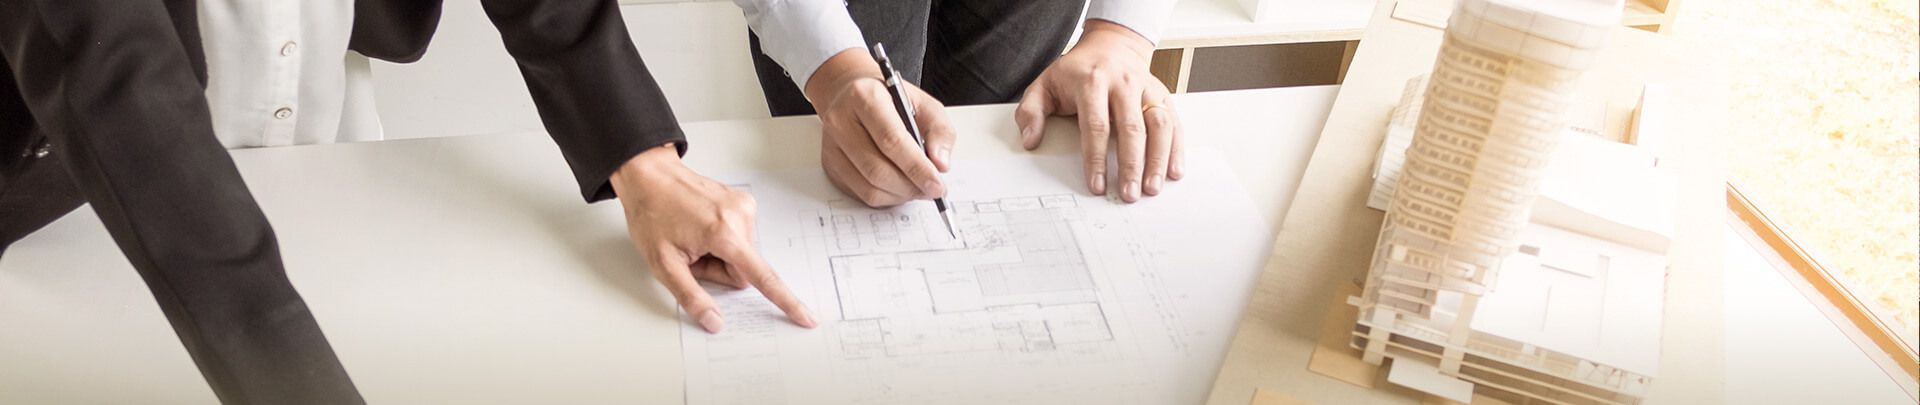 Plan Mehrfamilienhaus